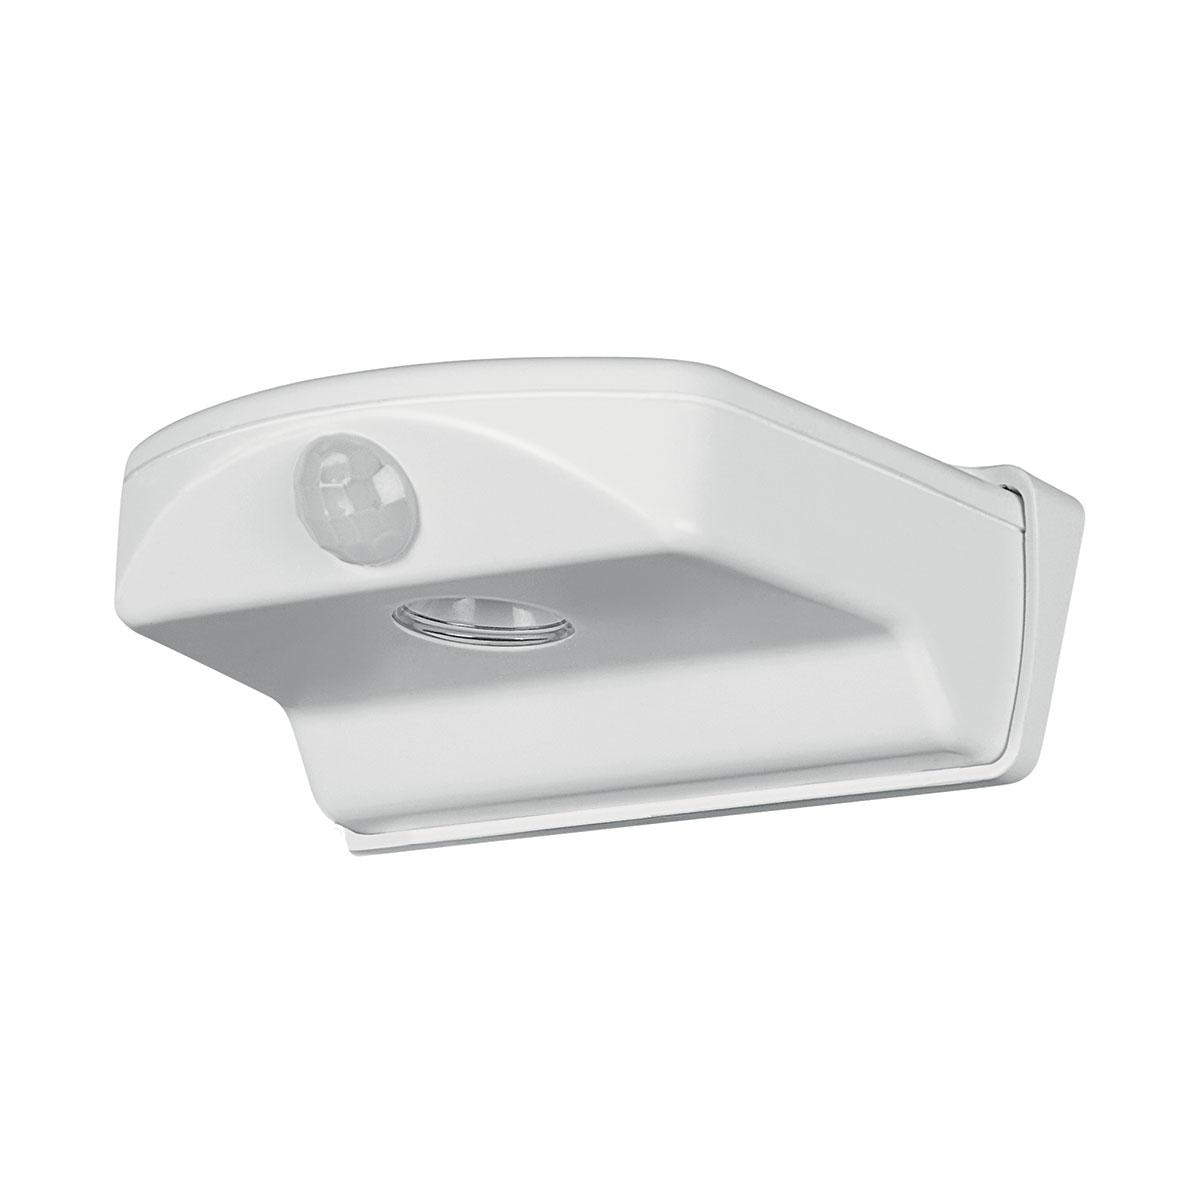 osram spot door led blanc lampe de bureau osram sur. Black Bedroom Furniture Sets. Home Design Ideas